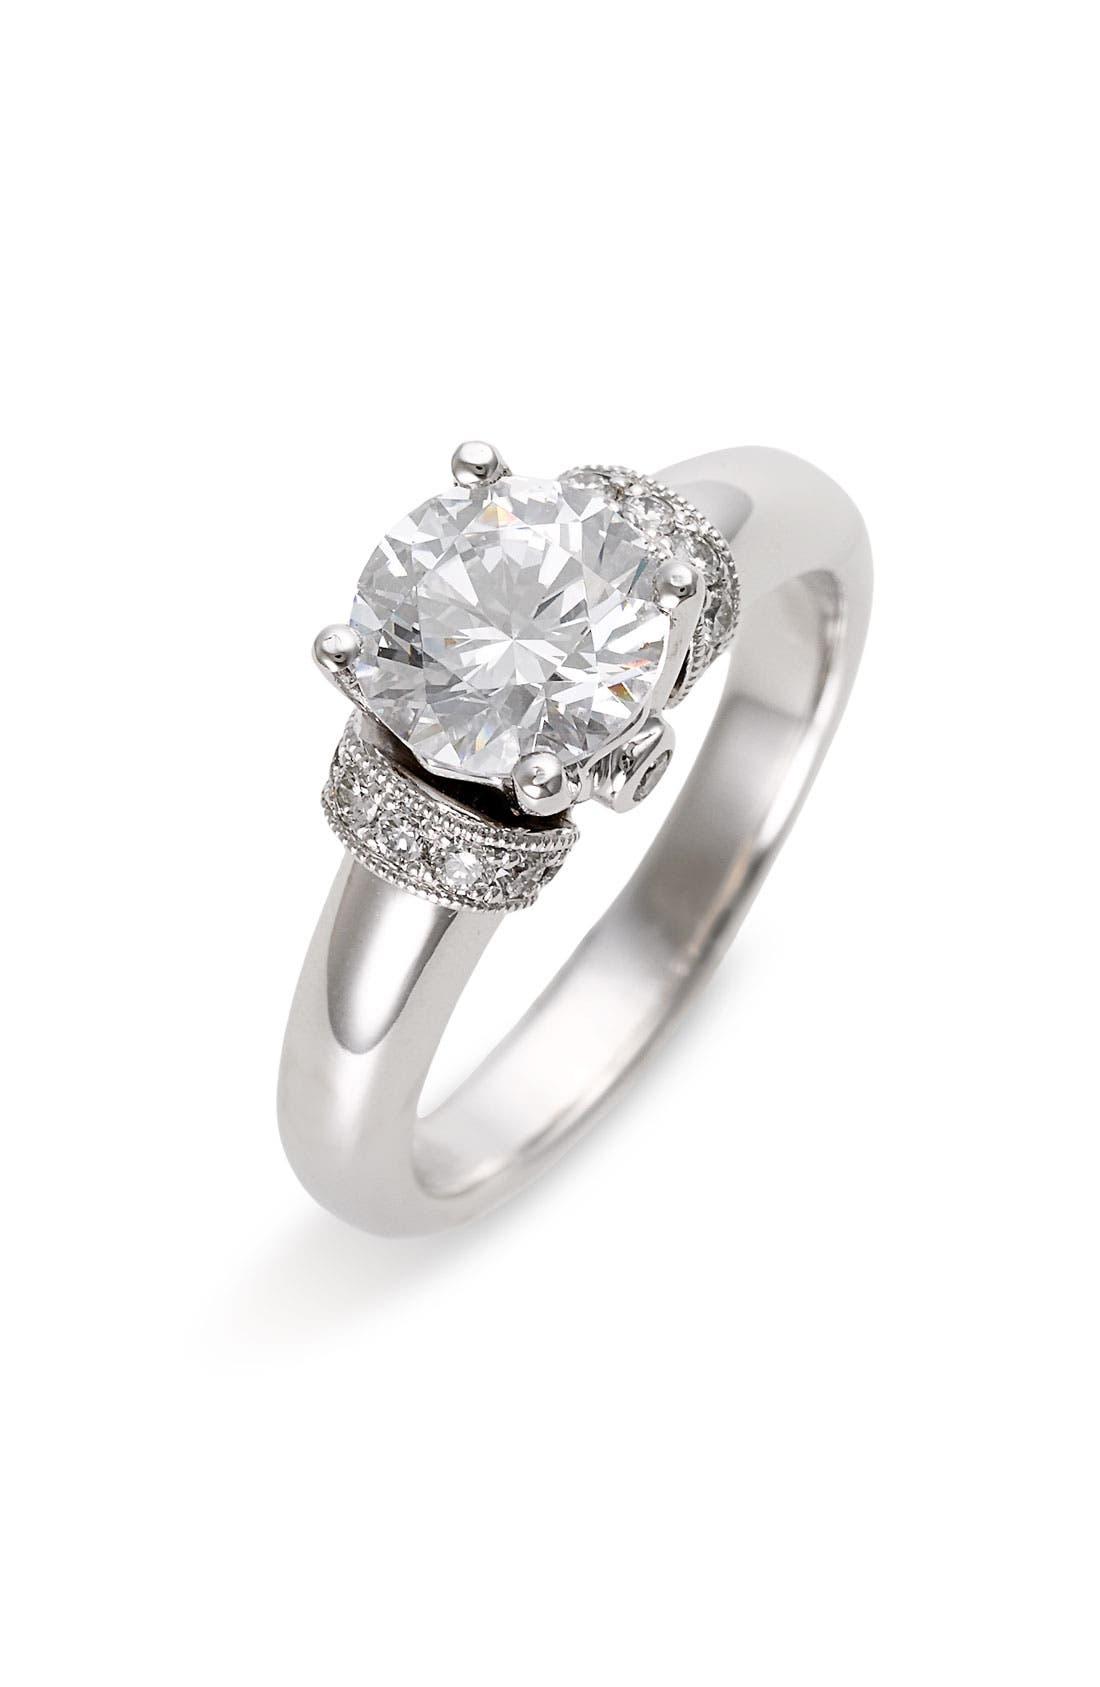 Main Image - Jack Kelége 'Romance' Diamond Engagement Ring Setting